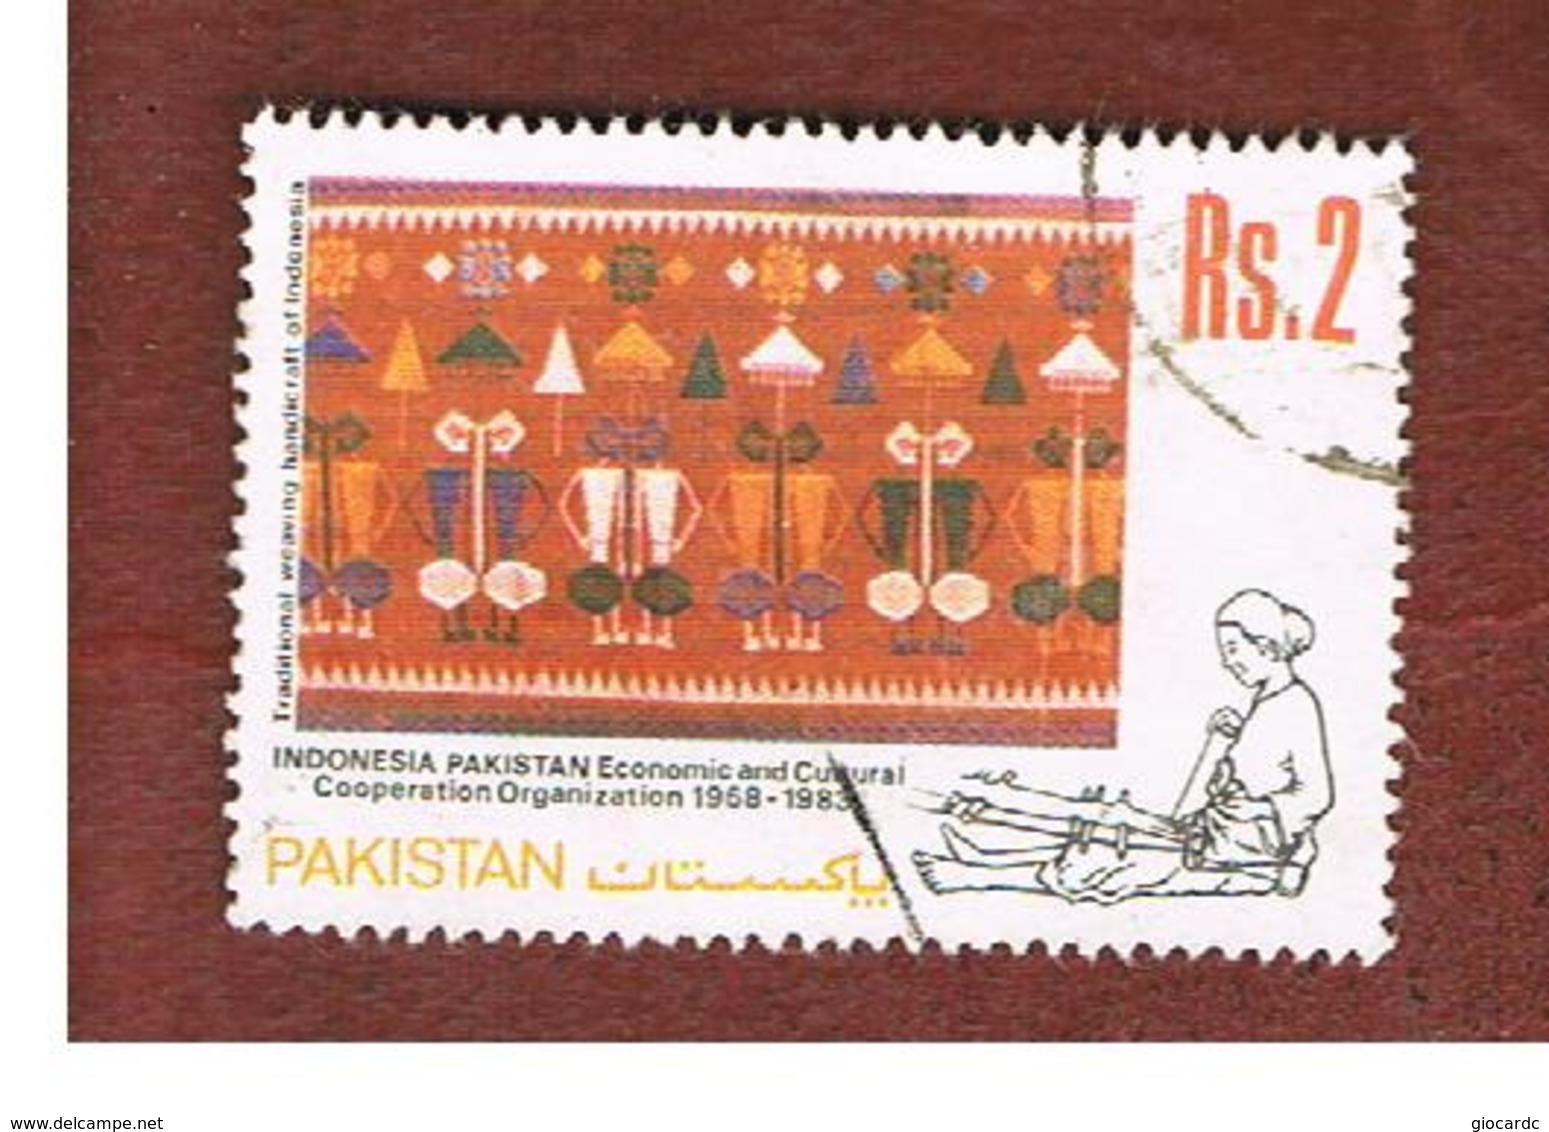 PAKISTAN  -  SG 604  -  1983  CO-OPERATION INDONESIA-PAKISTAN: CARPET -  USED ° - Pakistan